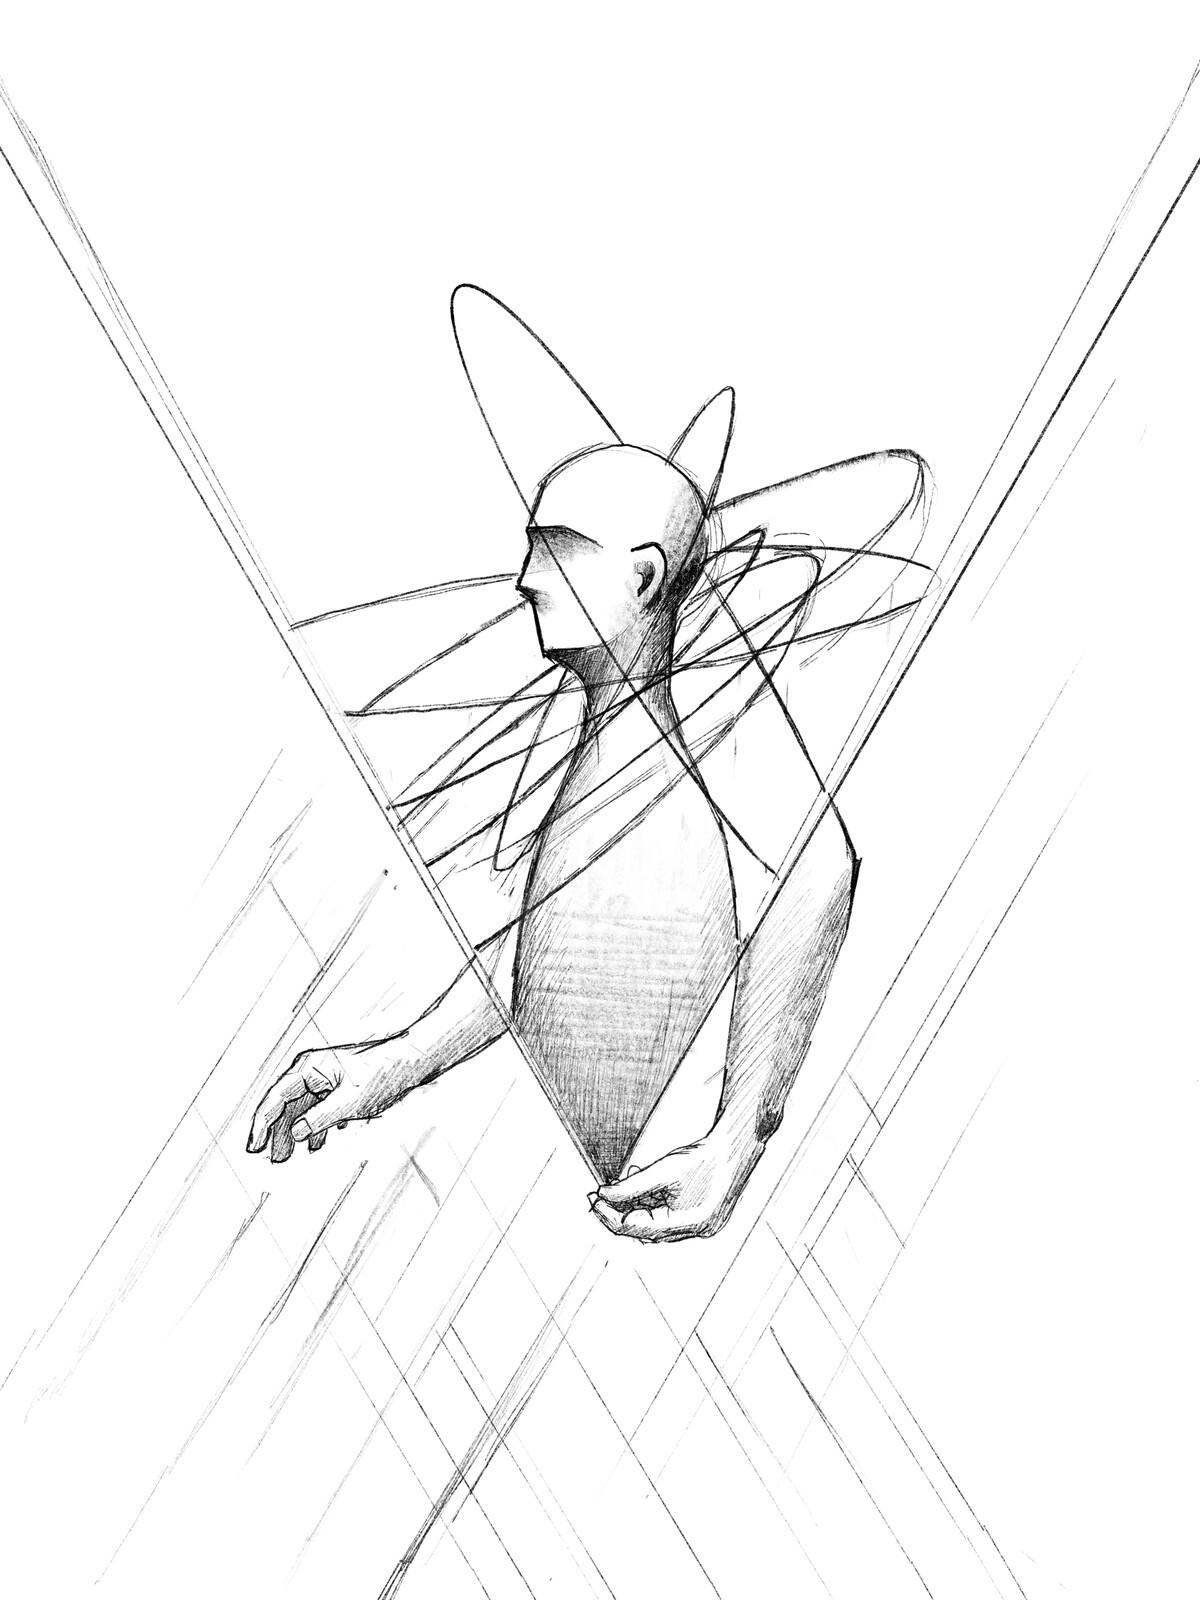 v.1 sketch